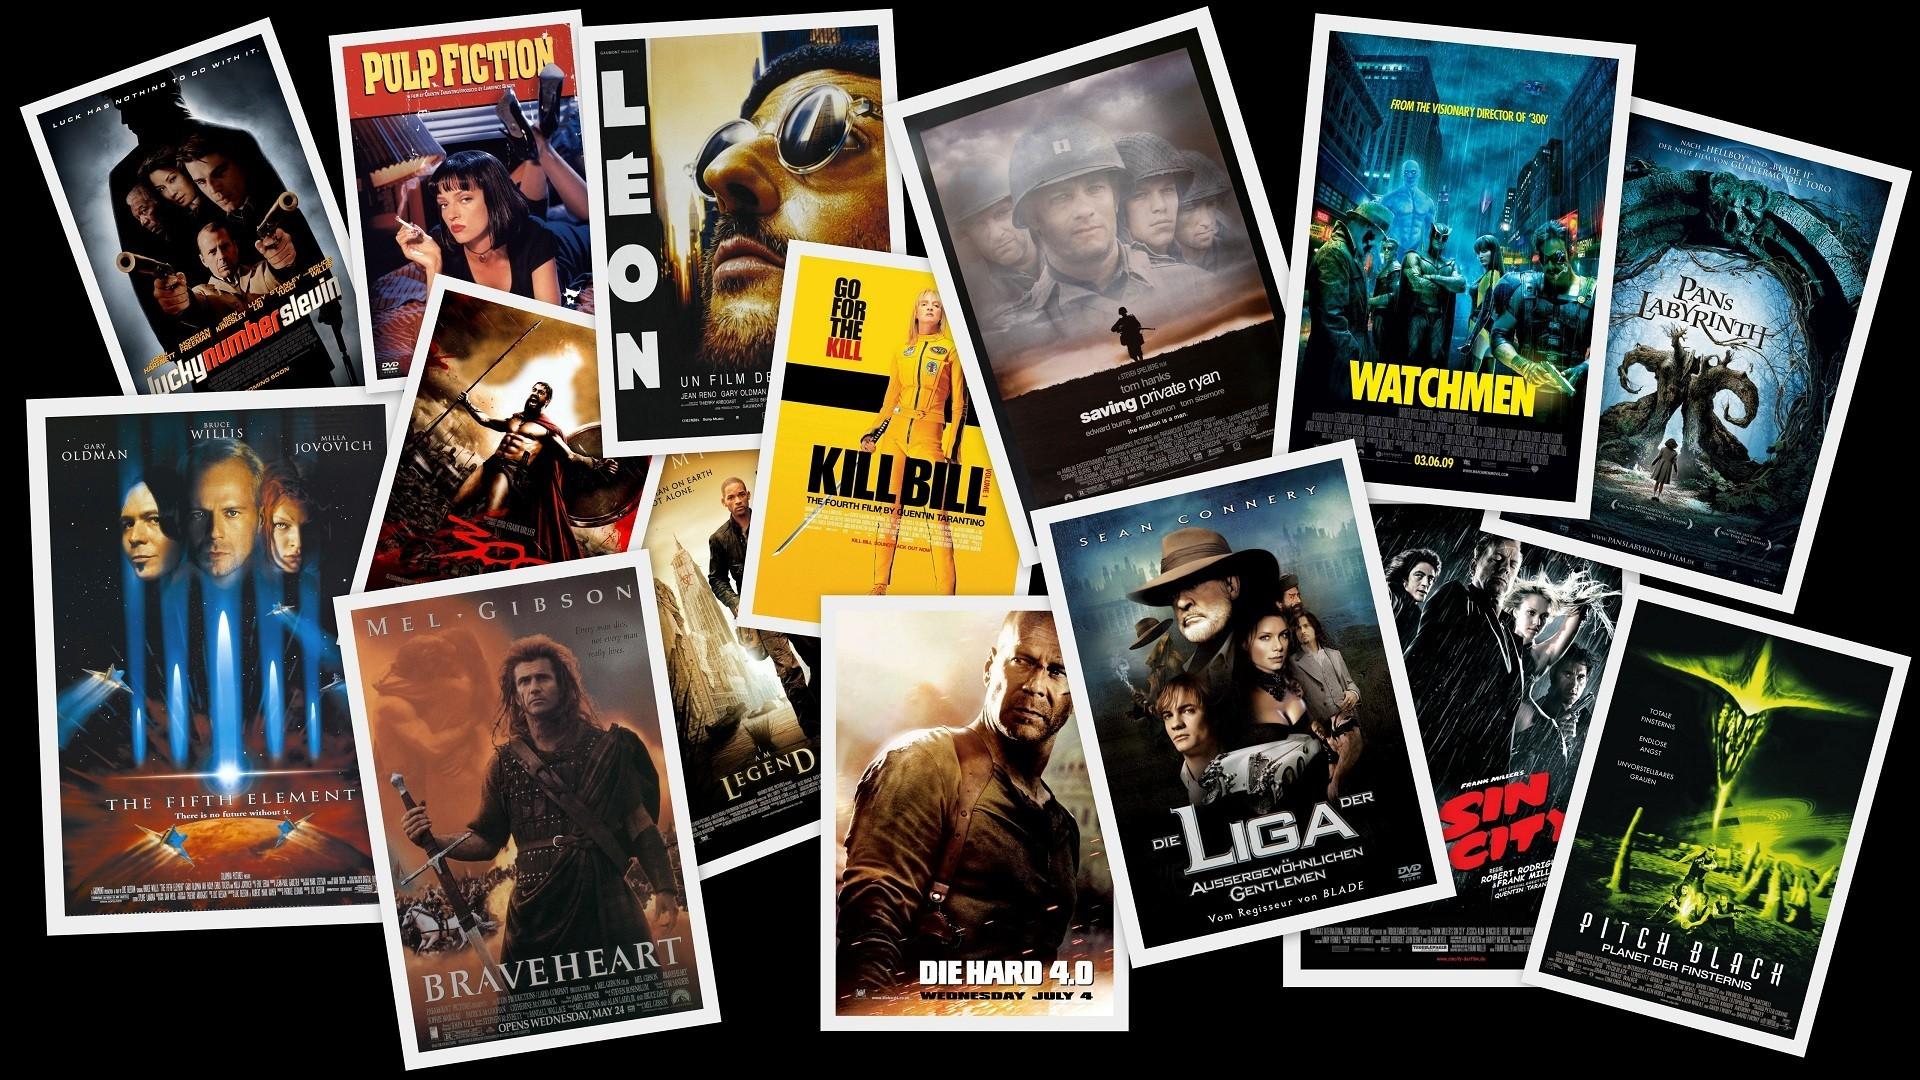 Movies Digital Art Collage Movie Posters Fan Art Wallpaper - Movie Genre - HD Wallpaper